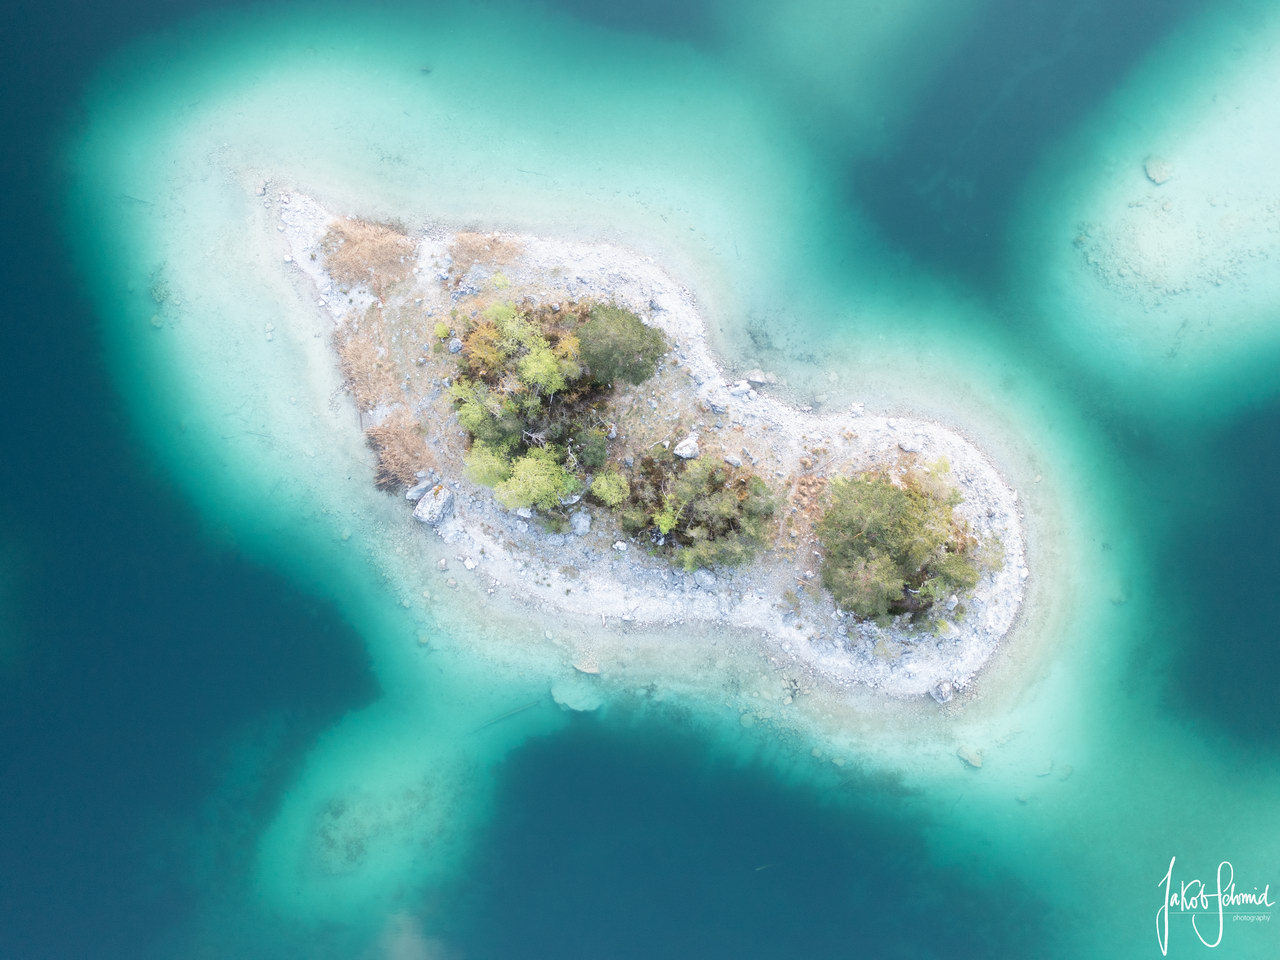 Bayern Eibsee Insel